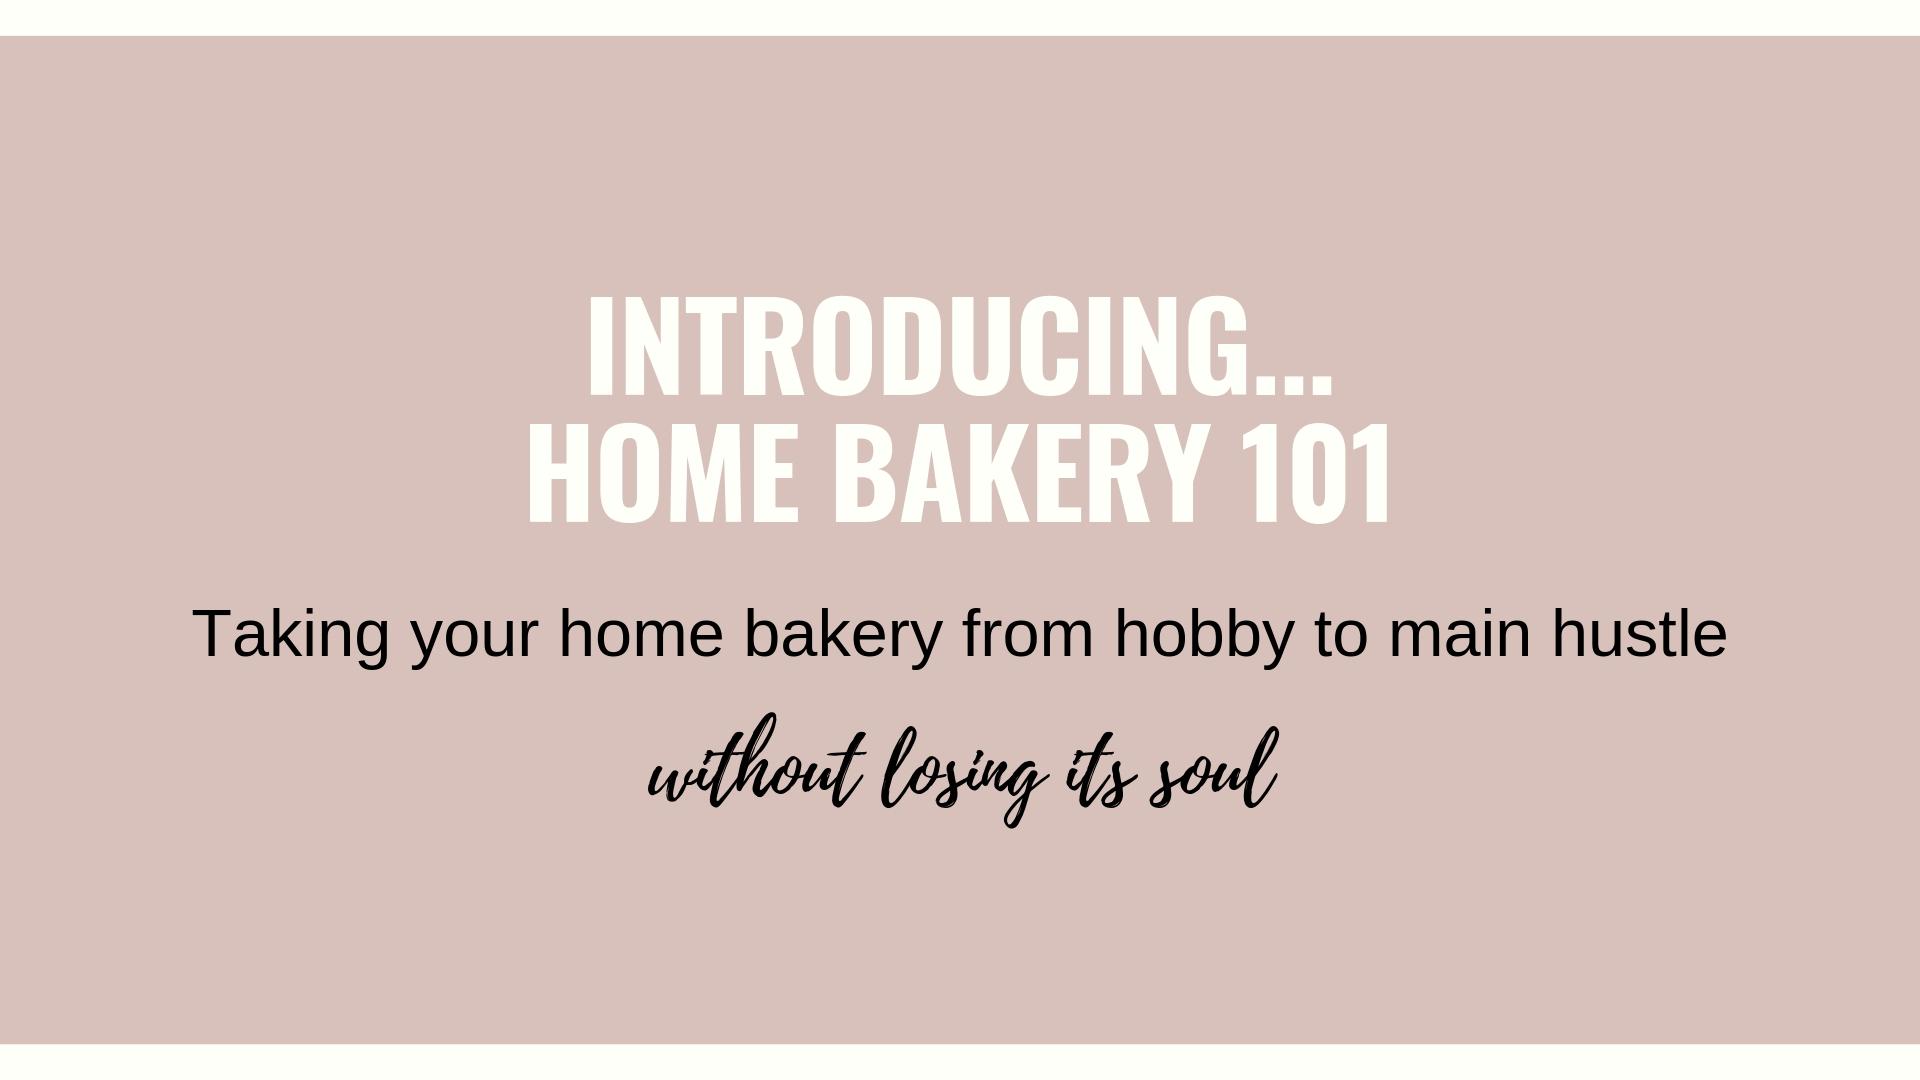 Home Bakery 101 cover photo.jpg